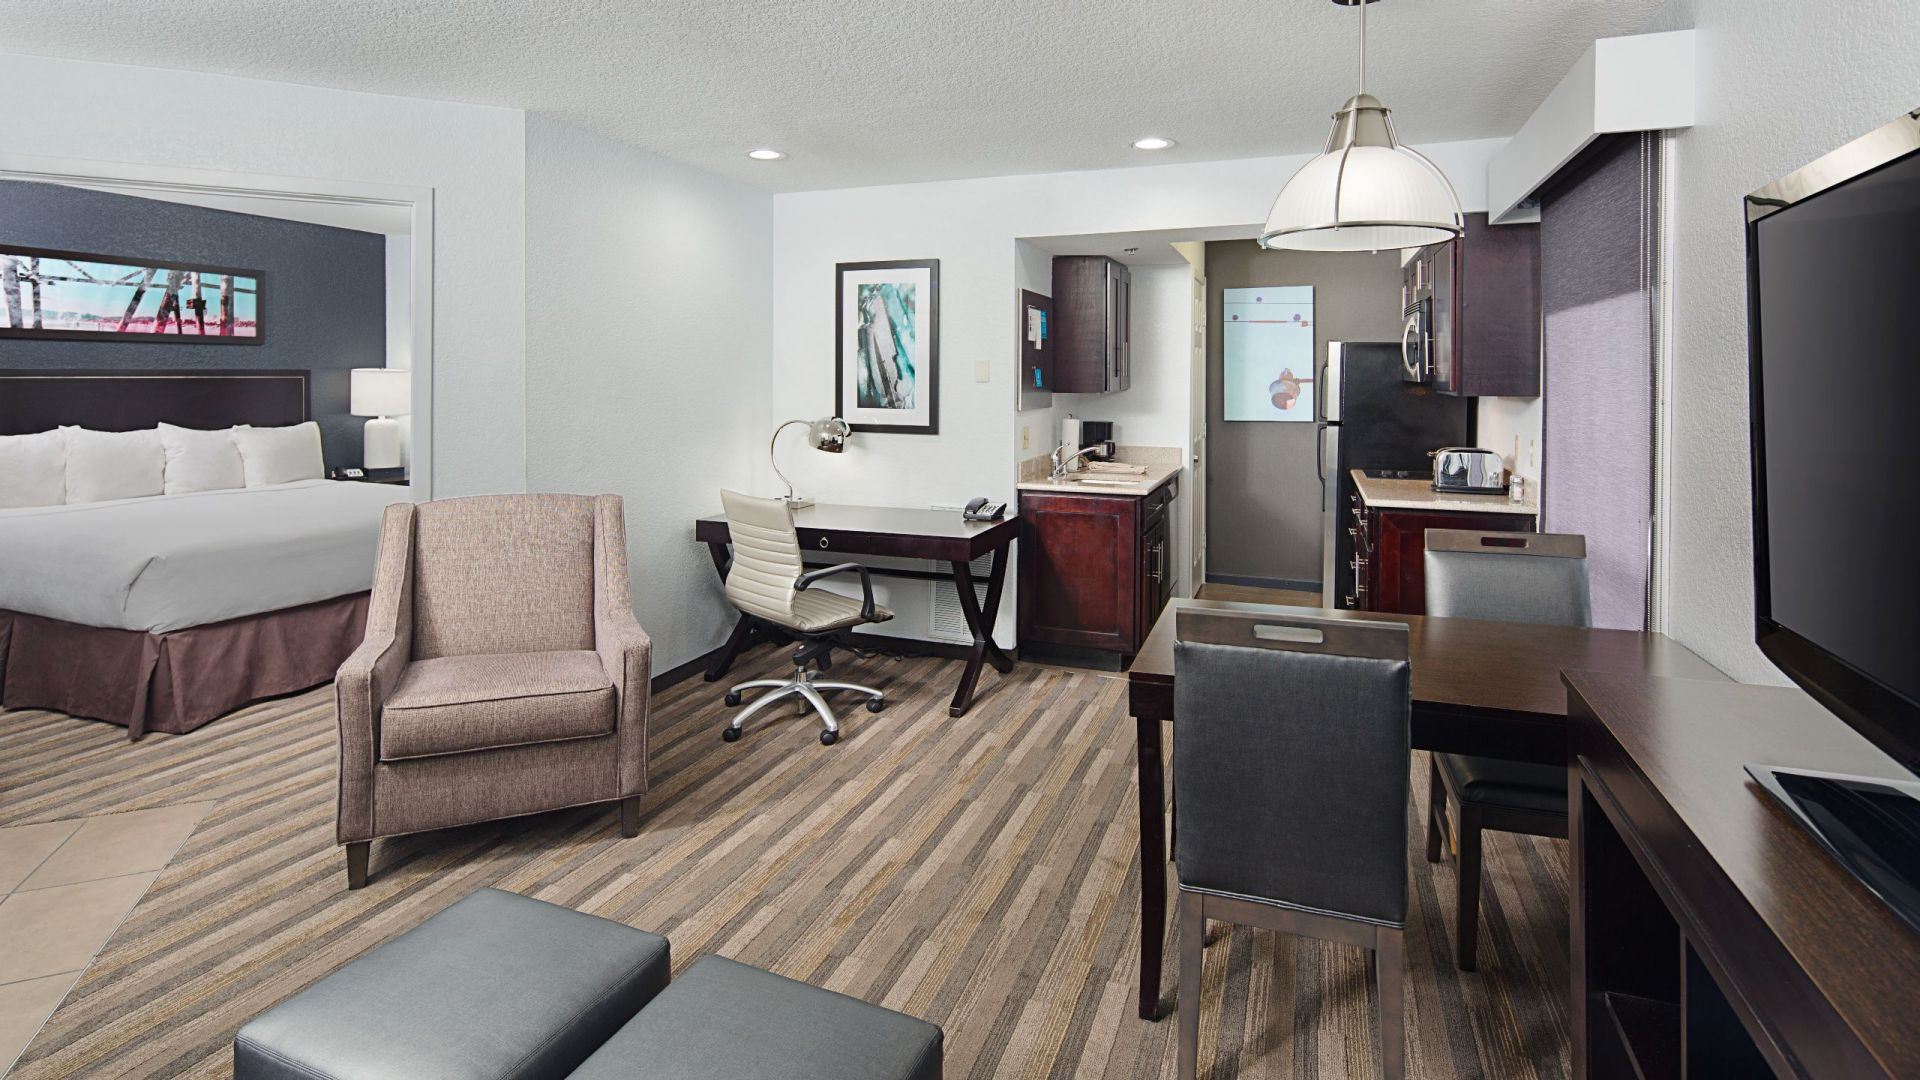 Hyatt House Los Angeles / El Segundo 2 bedroom suite